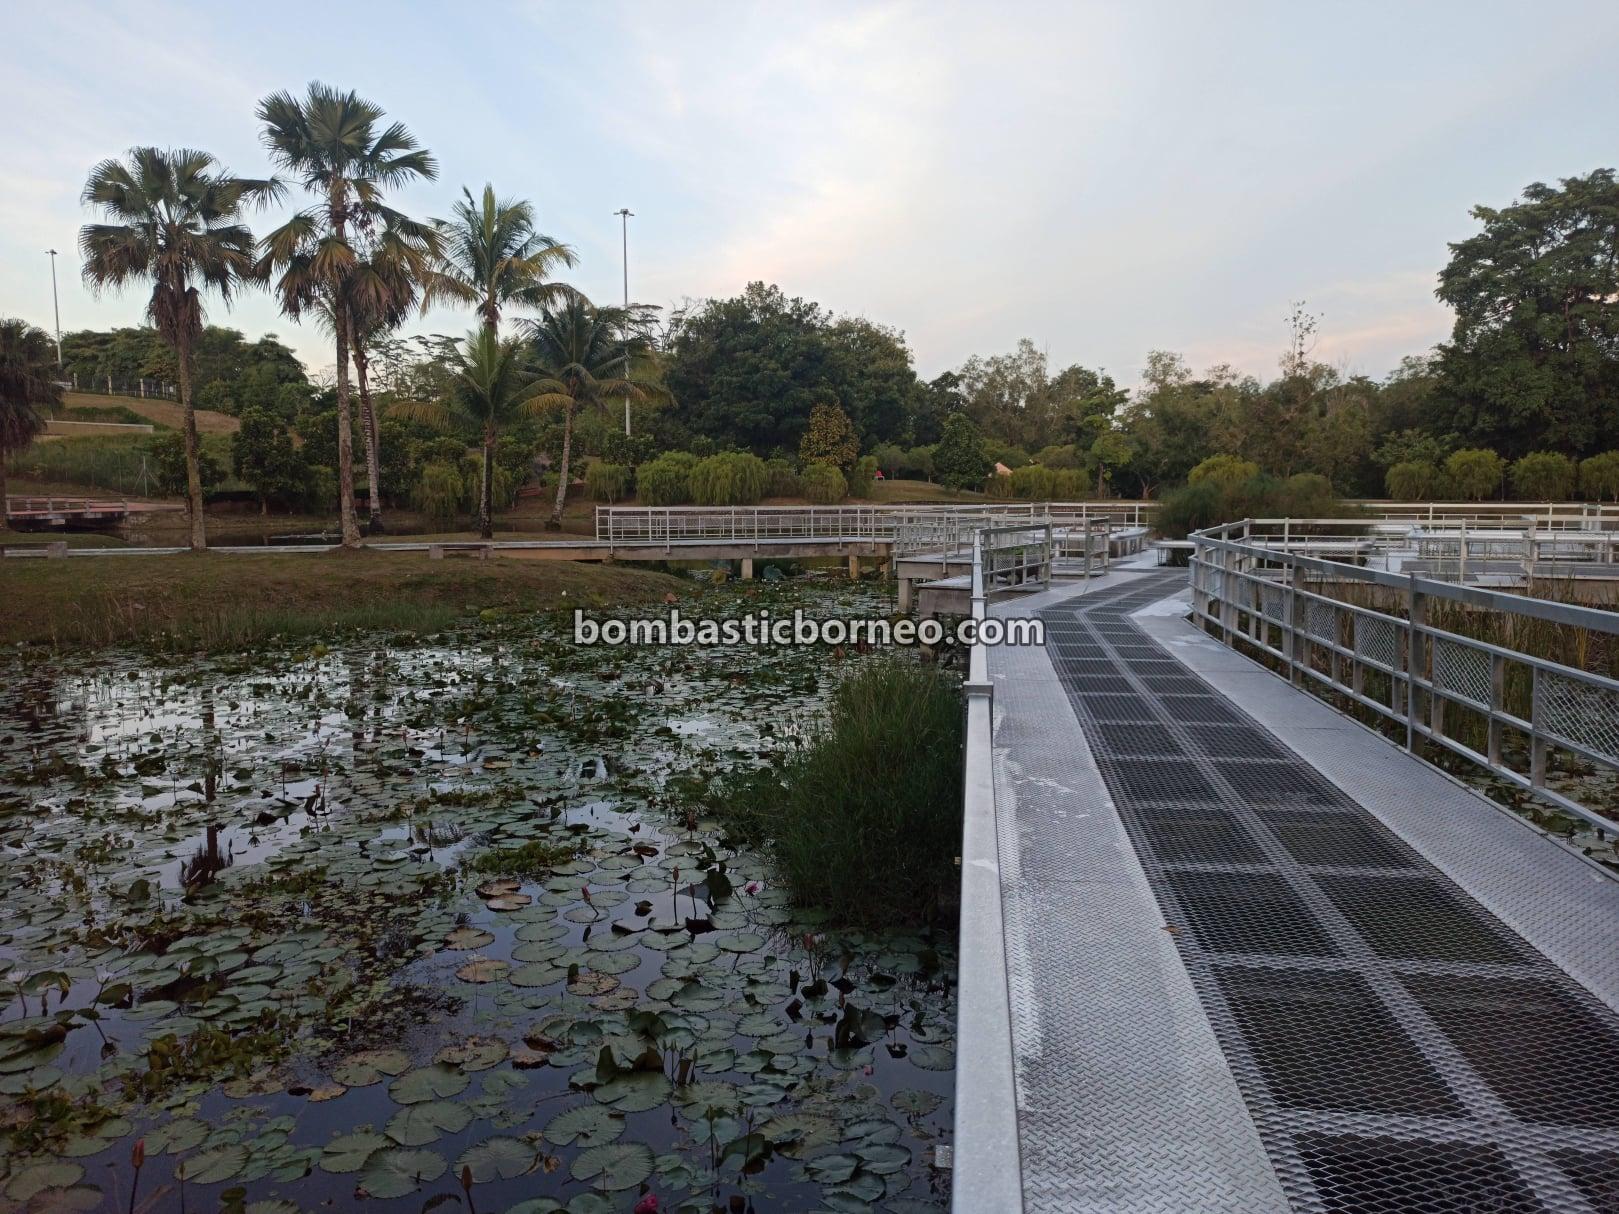 Sarawak Botanical Garden, recreational park, outdoor, exercise, jogging, walking, nature, Malaysia, Borneo, manmade lake, Tourism, tourist attraction, travel locally, 砂拉越植物园, 古晋健康运动地方,